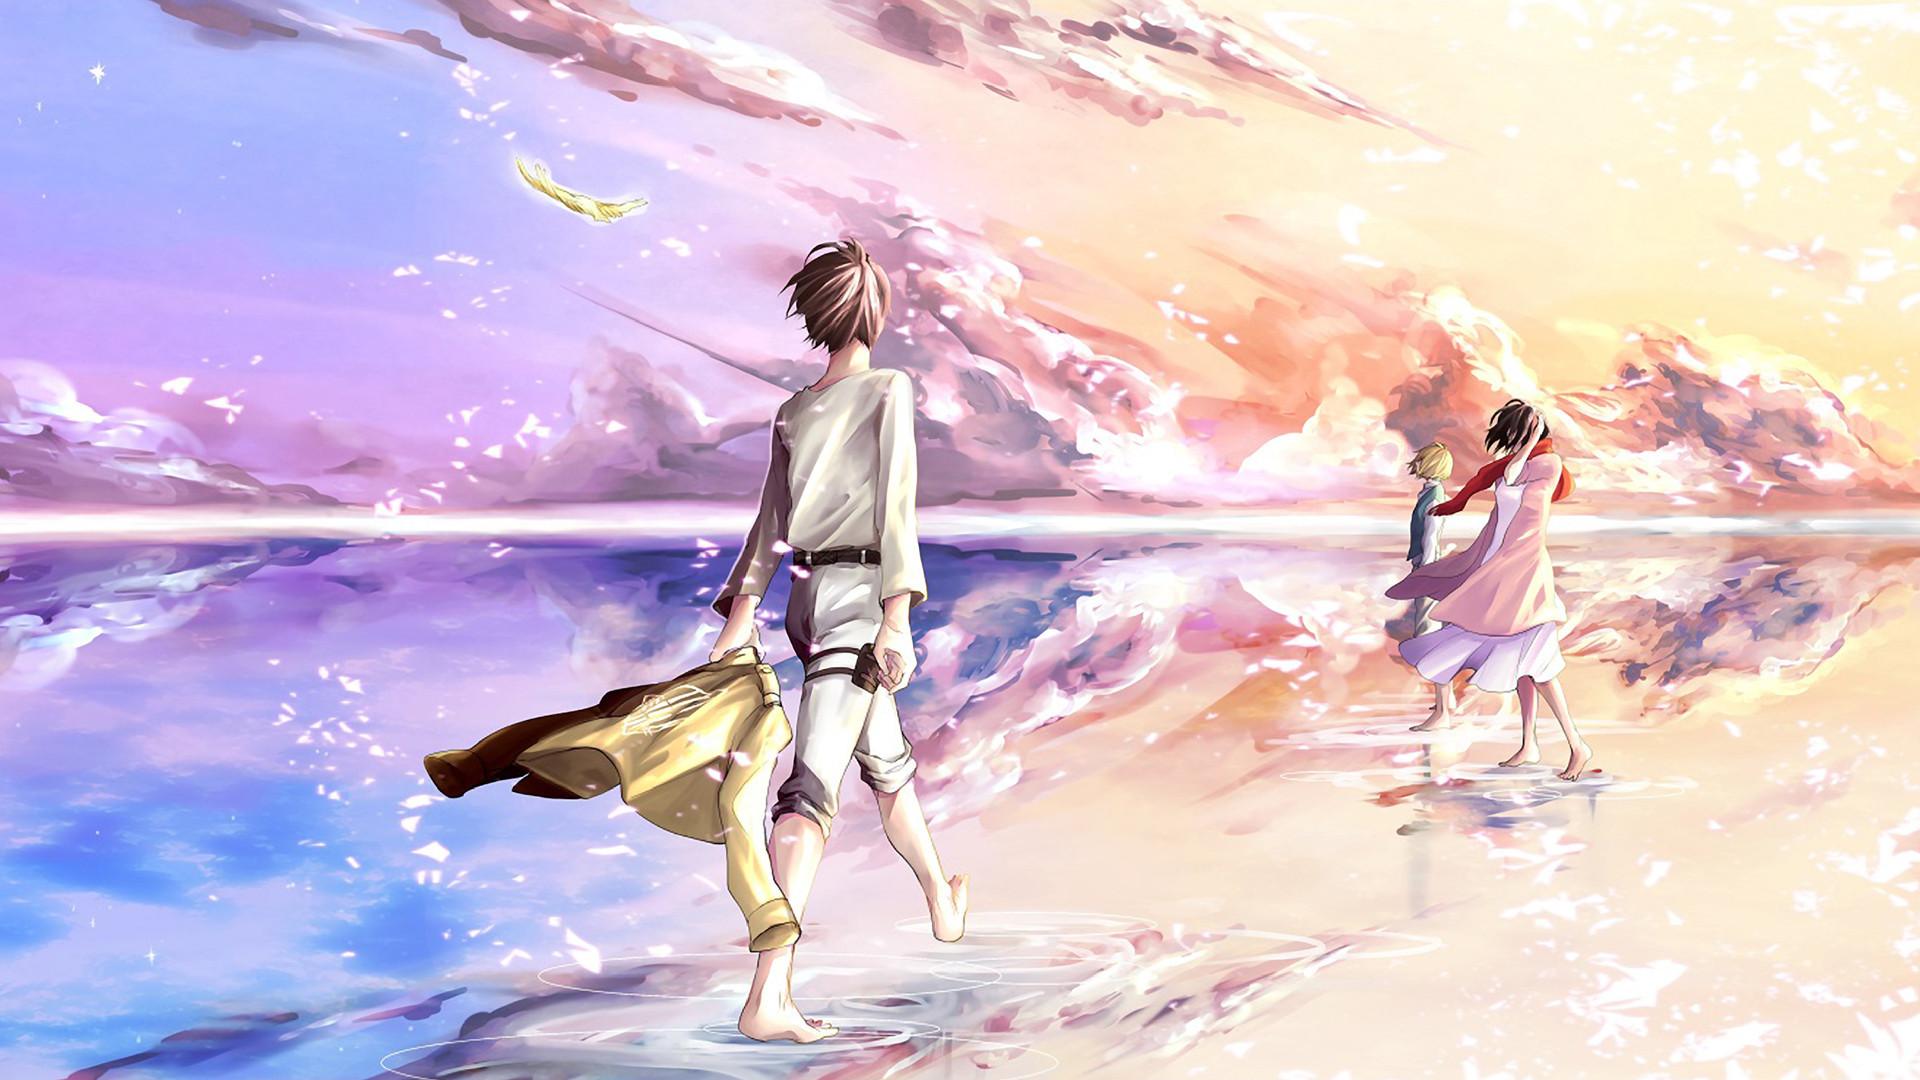 Shingeki no Kyojin » Fanart » Wallpaper | Pastel cloudy skies | #eren  #armin #mikasa | Shingeki no Kyojin | Pinterest | Armin, Fanart and Anime